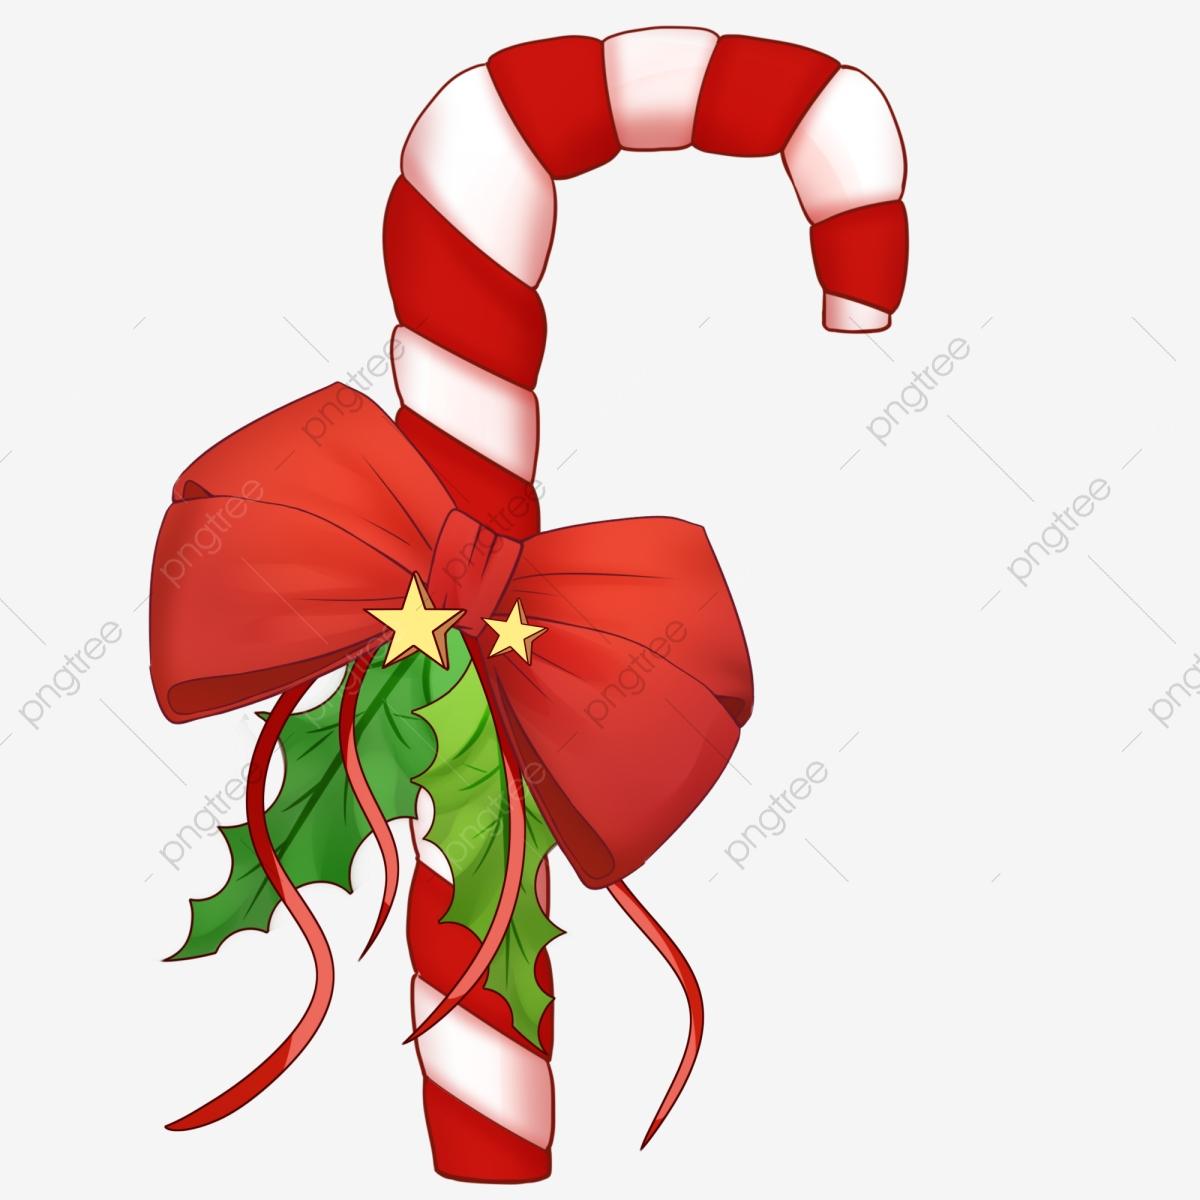 Christmas Christmas Christmas Candy Cane Gift, Festive, Pine, Bow.